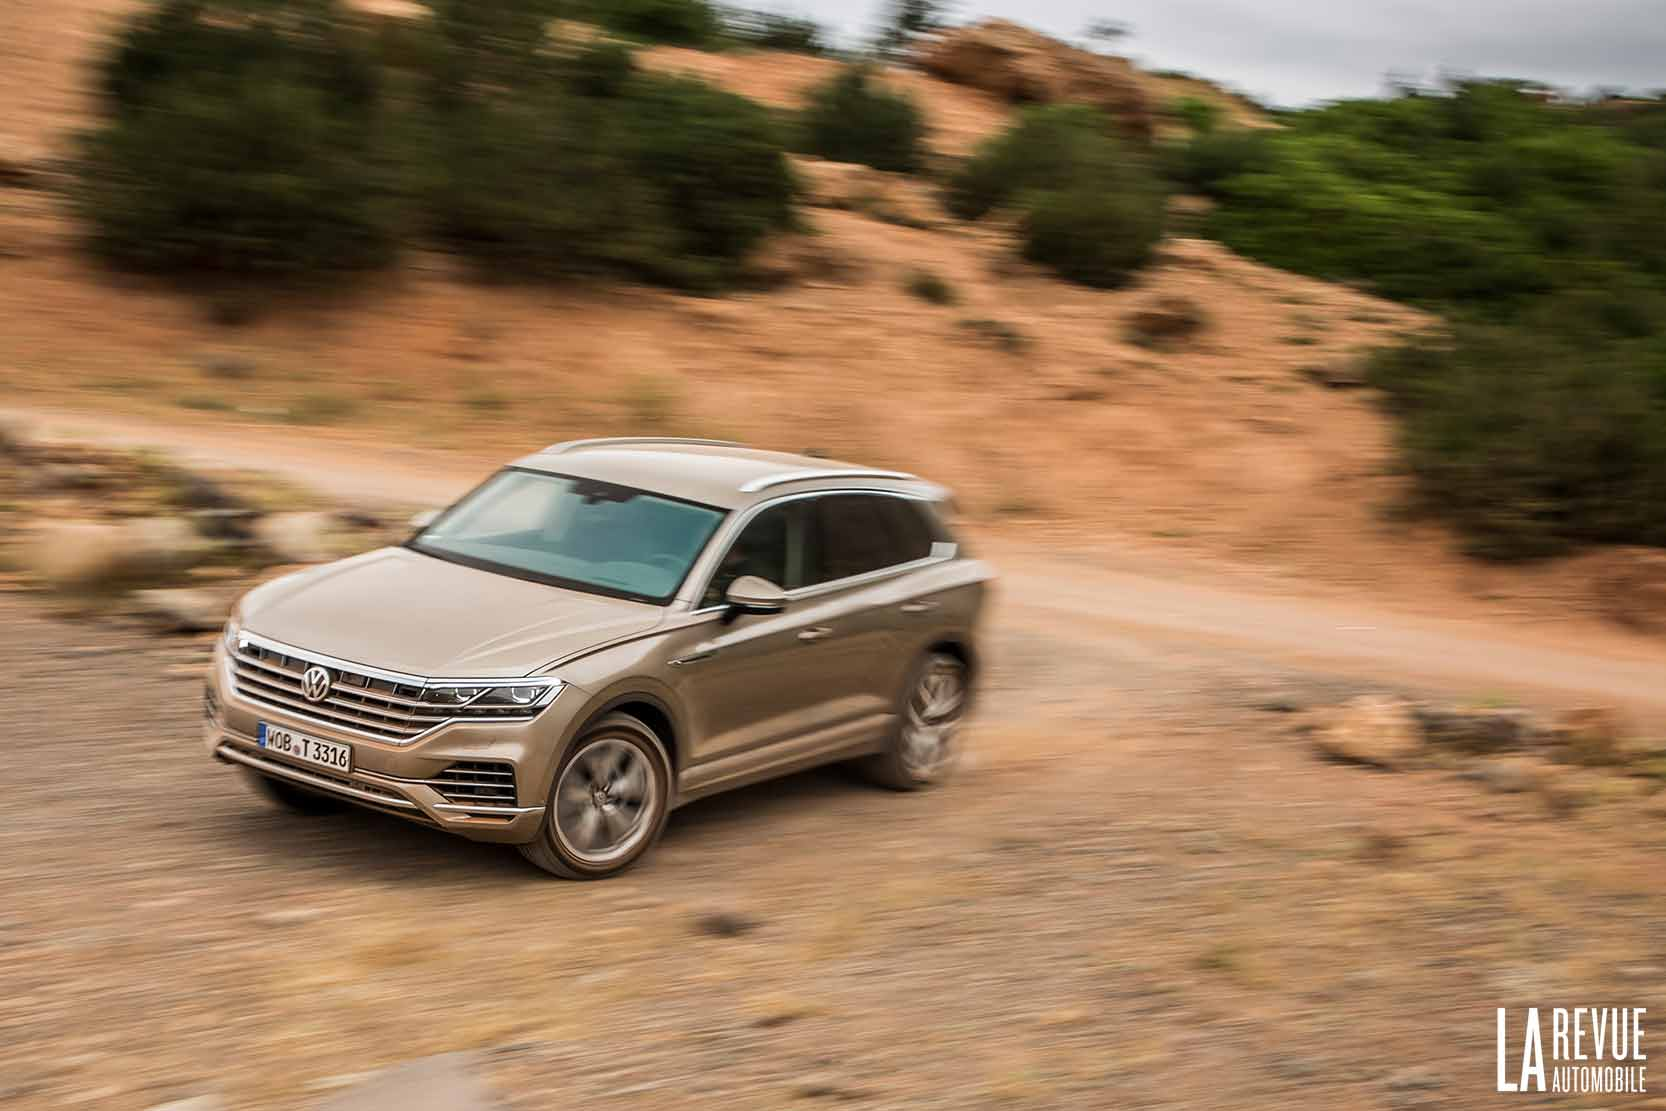 Essai du Volkswagen Touareg V6 TDI dans des pistes Offroad